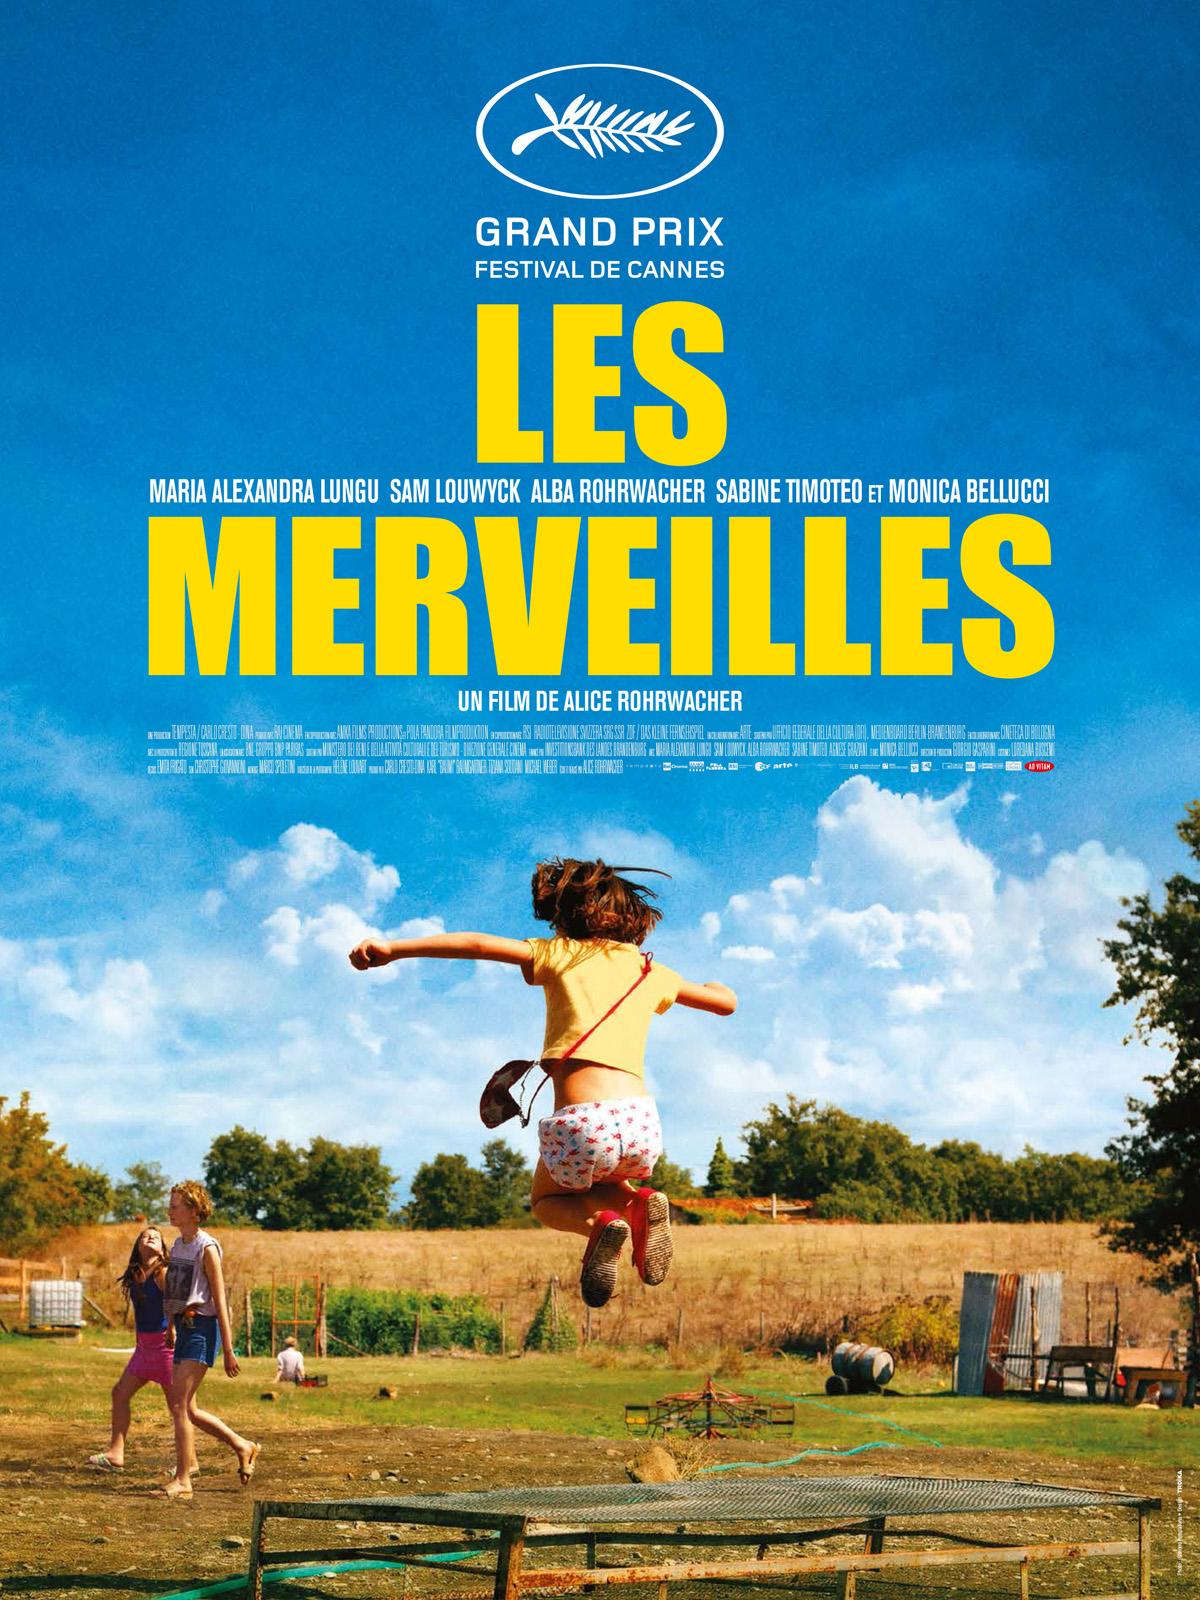 Les Merveilles (film) : merveilles, (film), Achat, Merveilles, AlloCiné